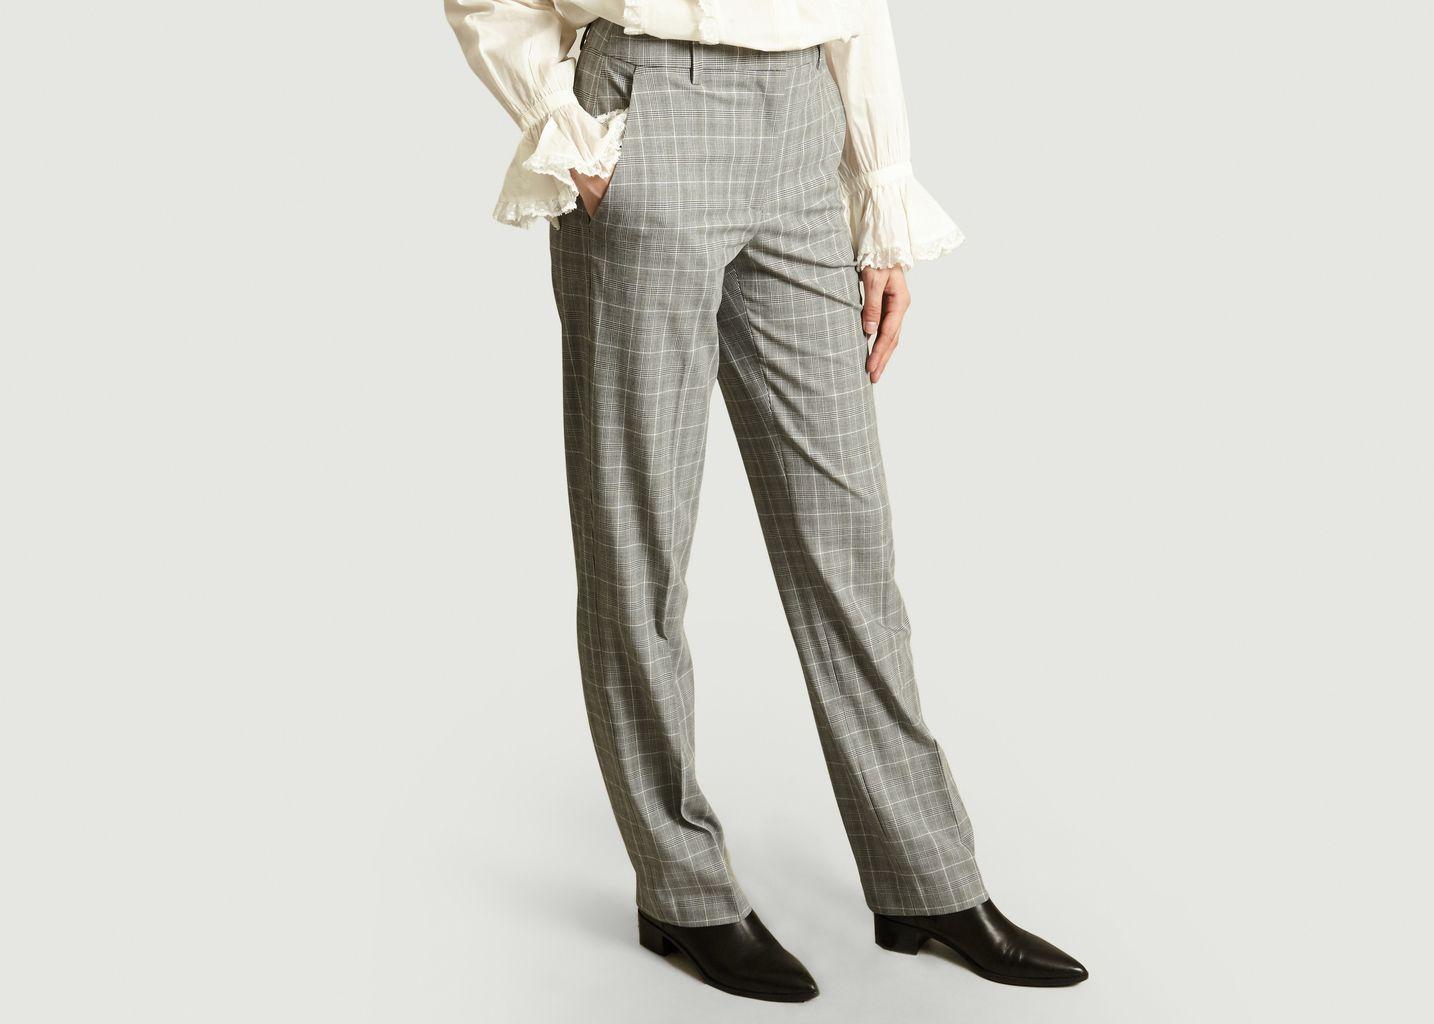 Pantalon Jambes Fuselées - Essentiel Antwerp